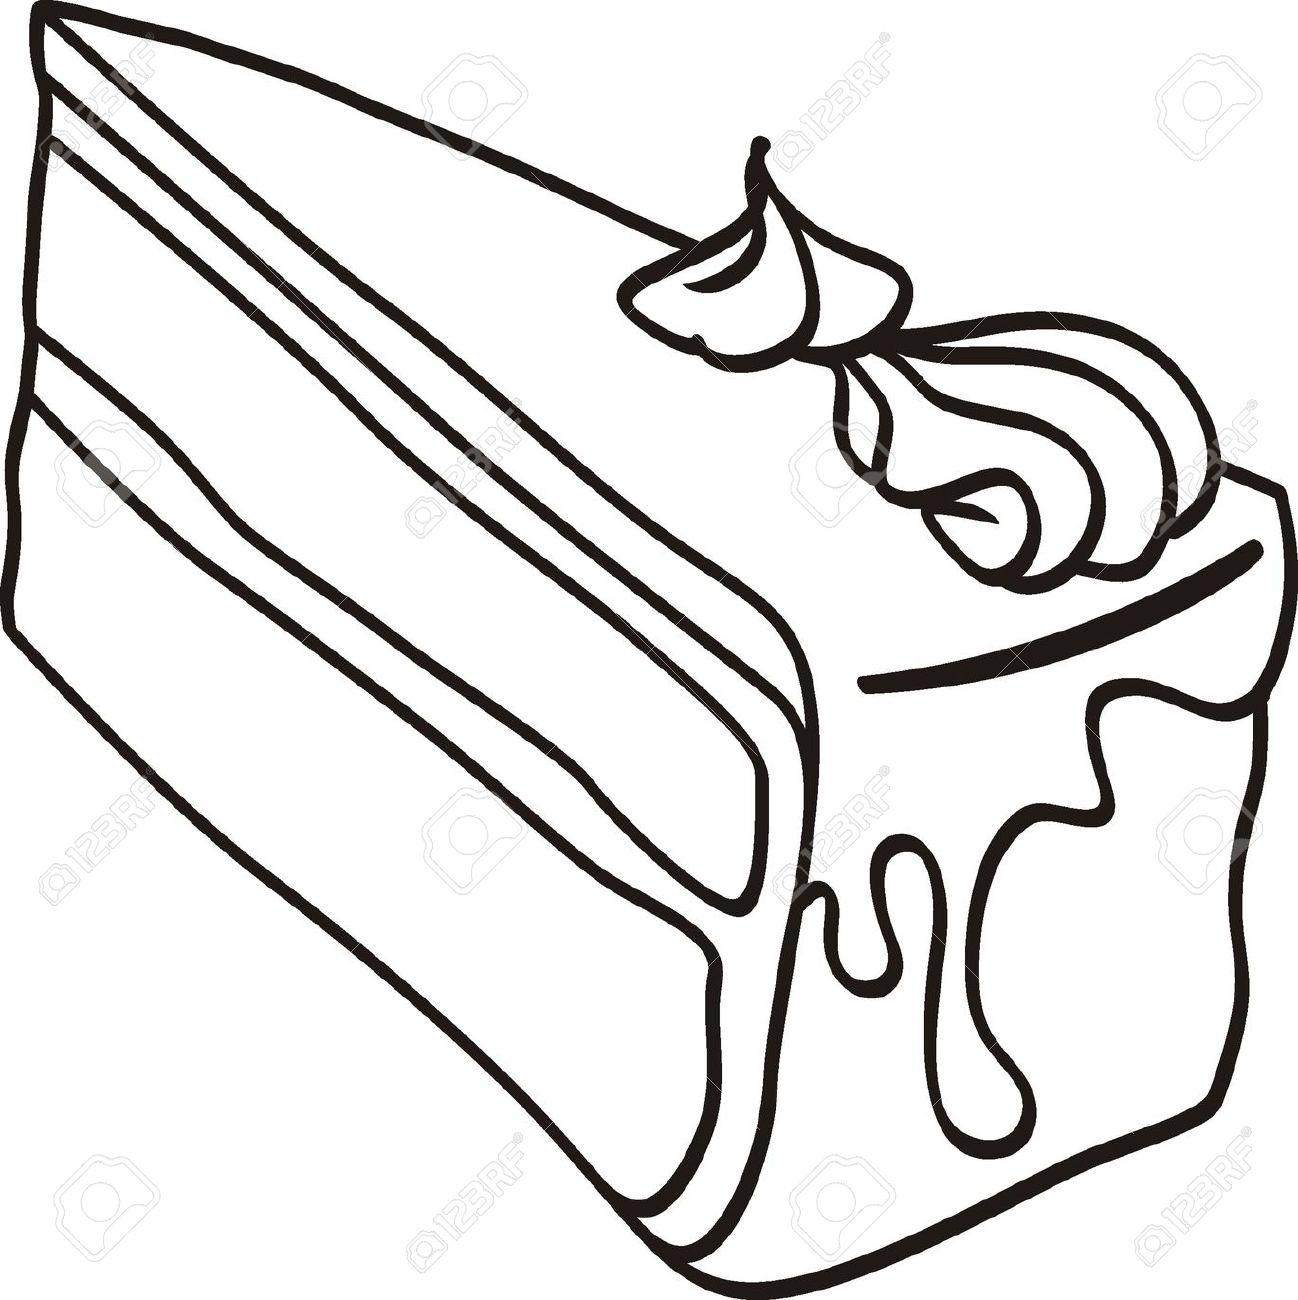 1298x1300 Clip Art Cake Slice Clip Art